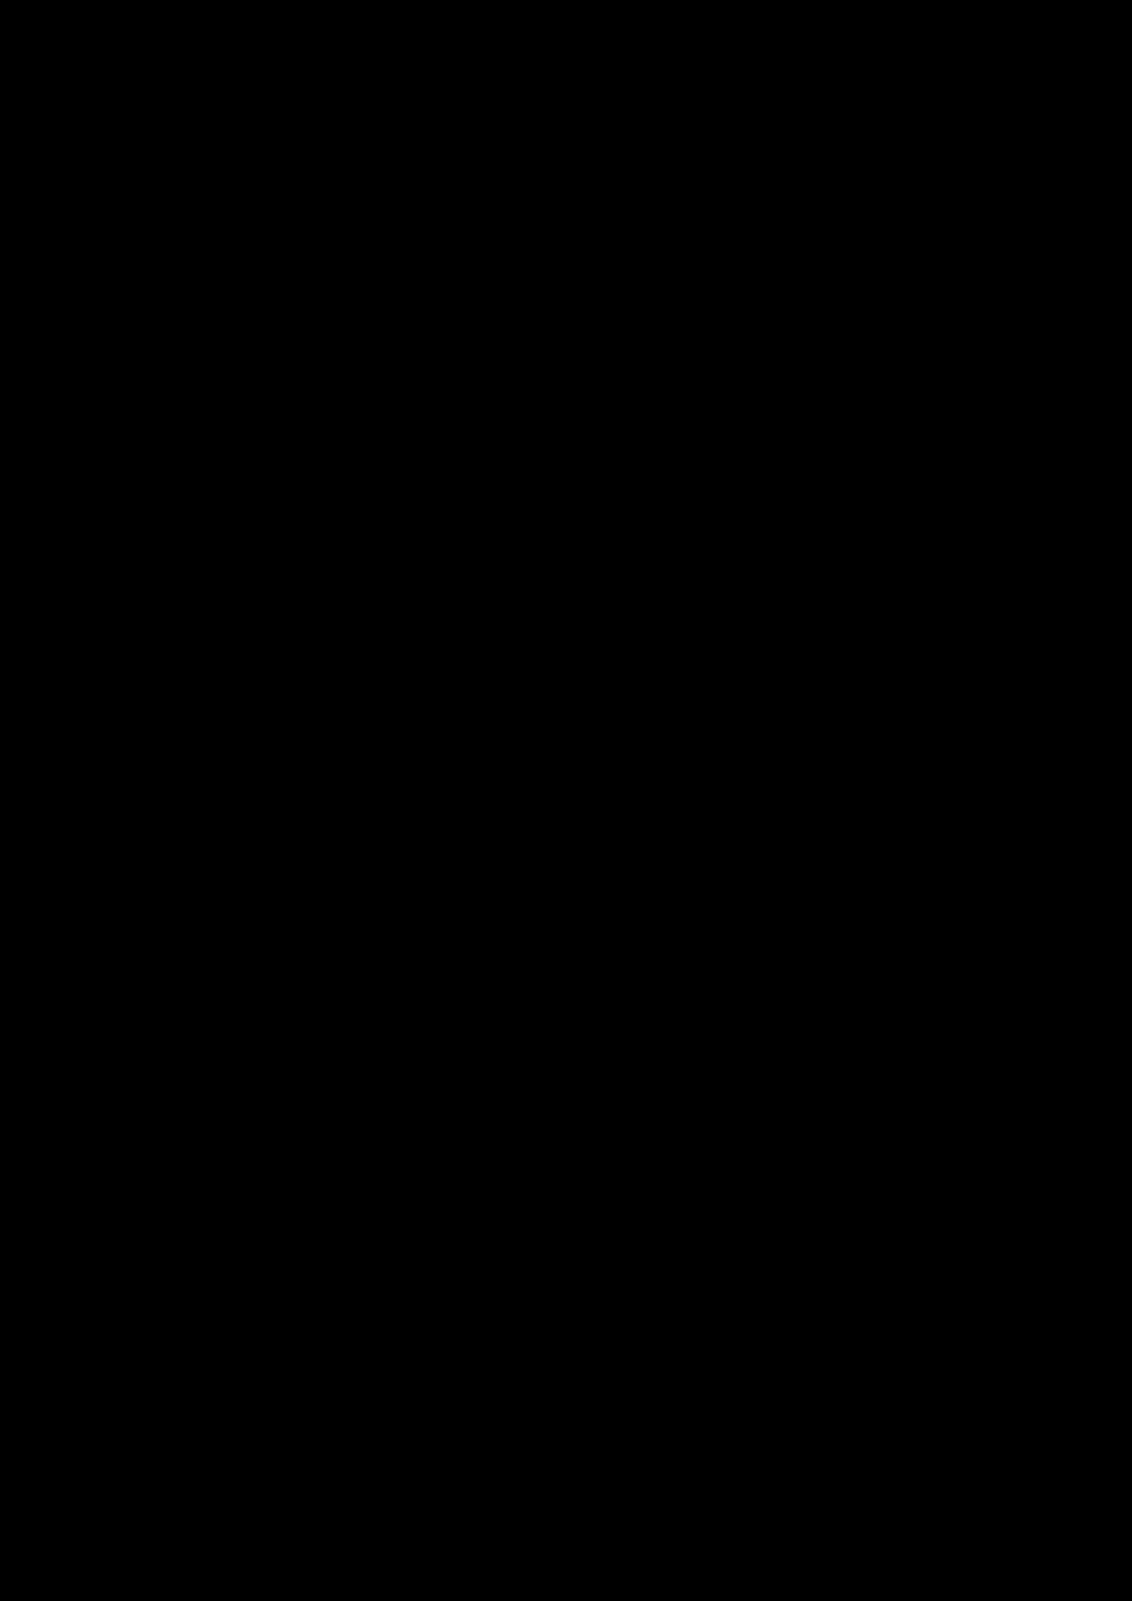 Ispoved Pervogo Boga slide, Image 49